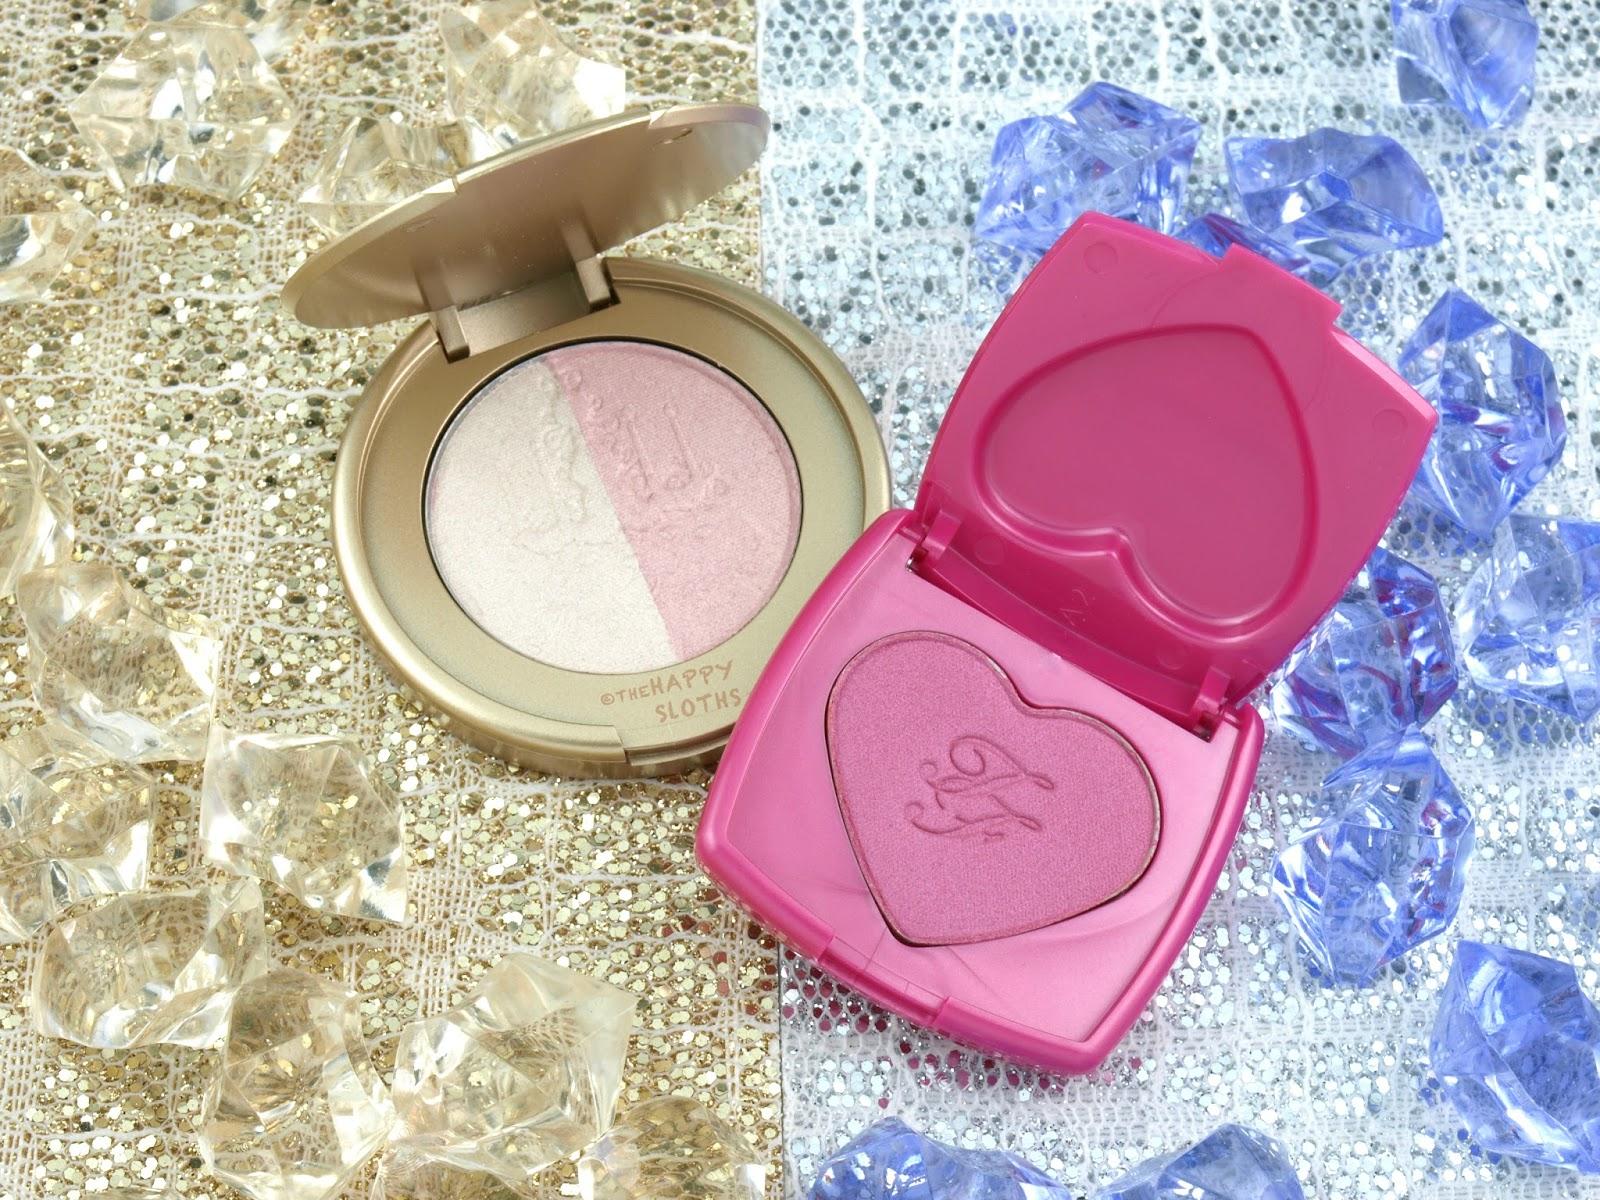 Too Faced x Kat Von D Cheek & Lip Makeup Bag Set: Review and Swatches